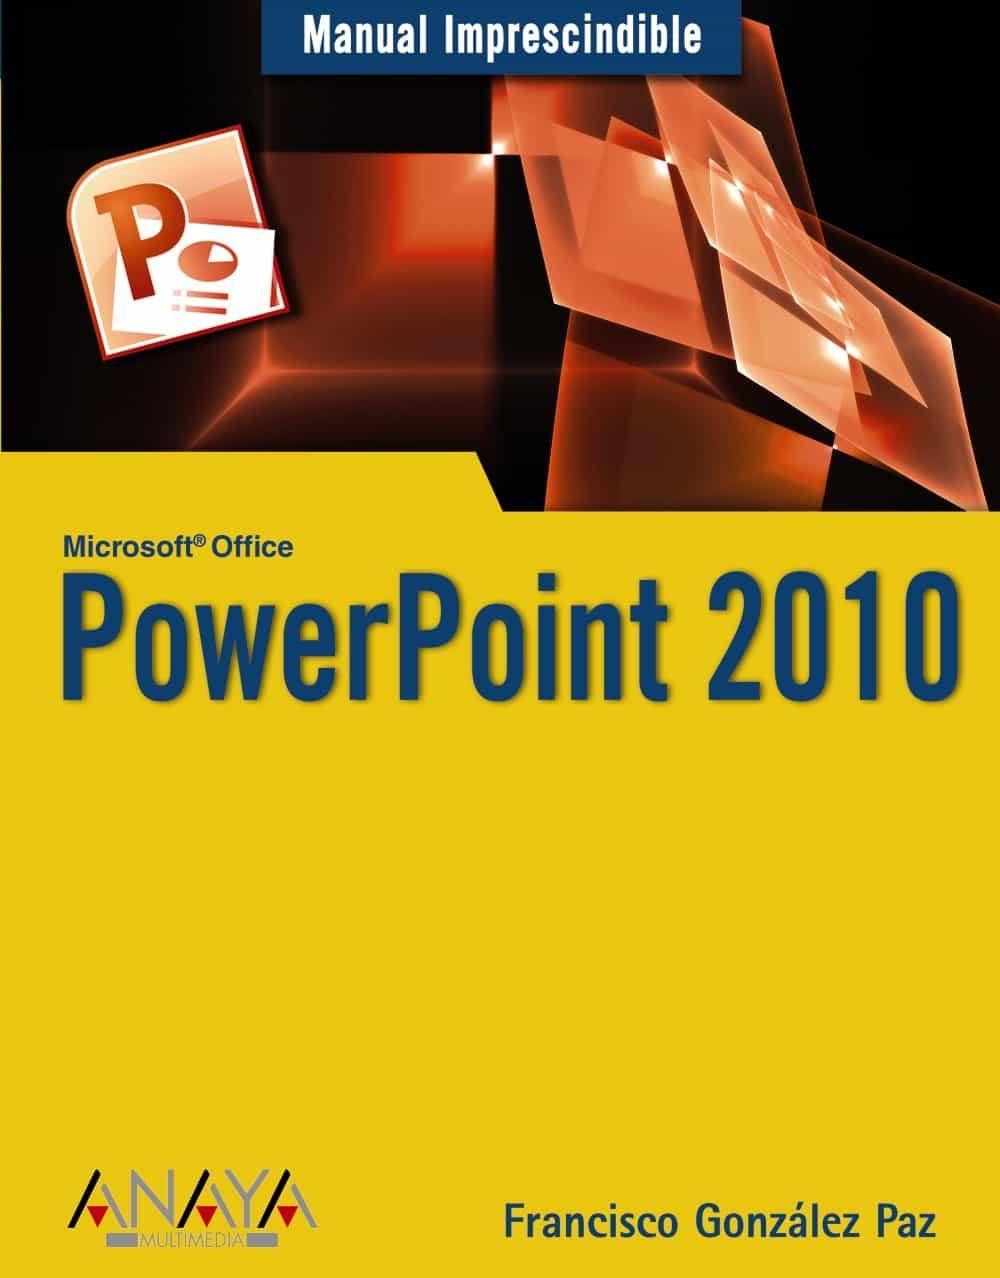 Powerpoint 2010 Manuales Imprescindibles Francisco Paz Gonzalez